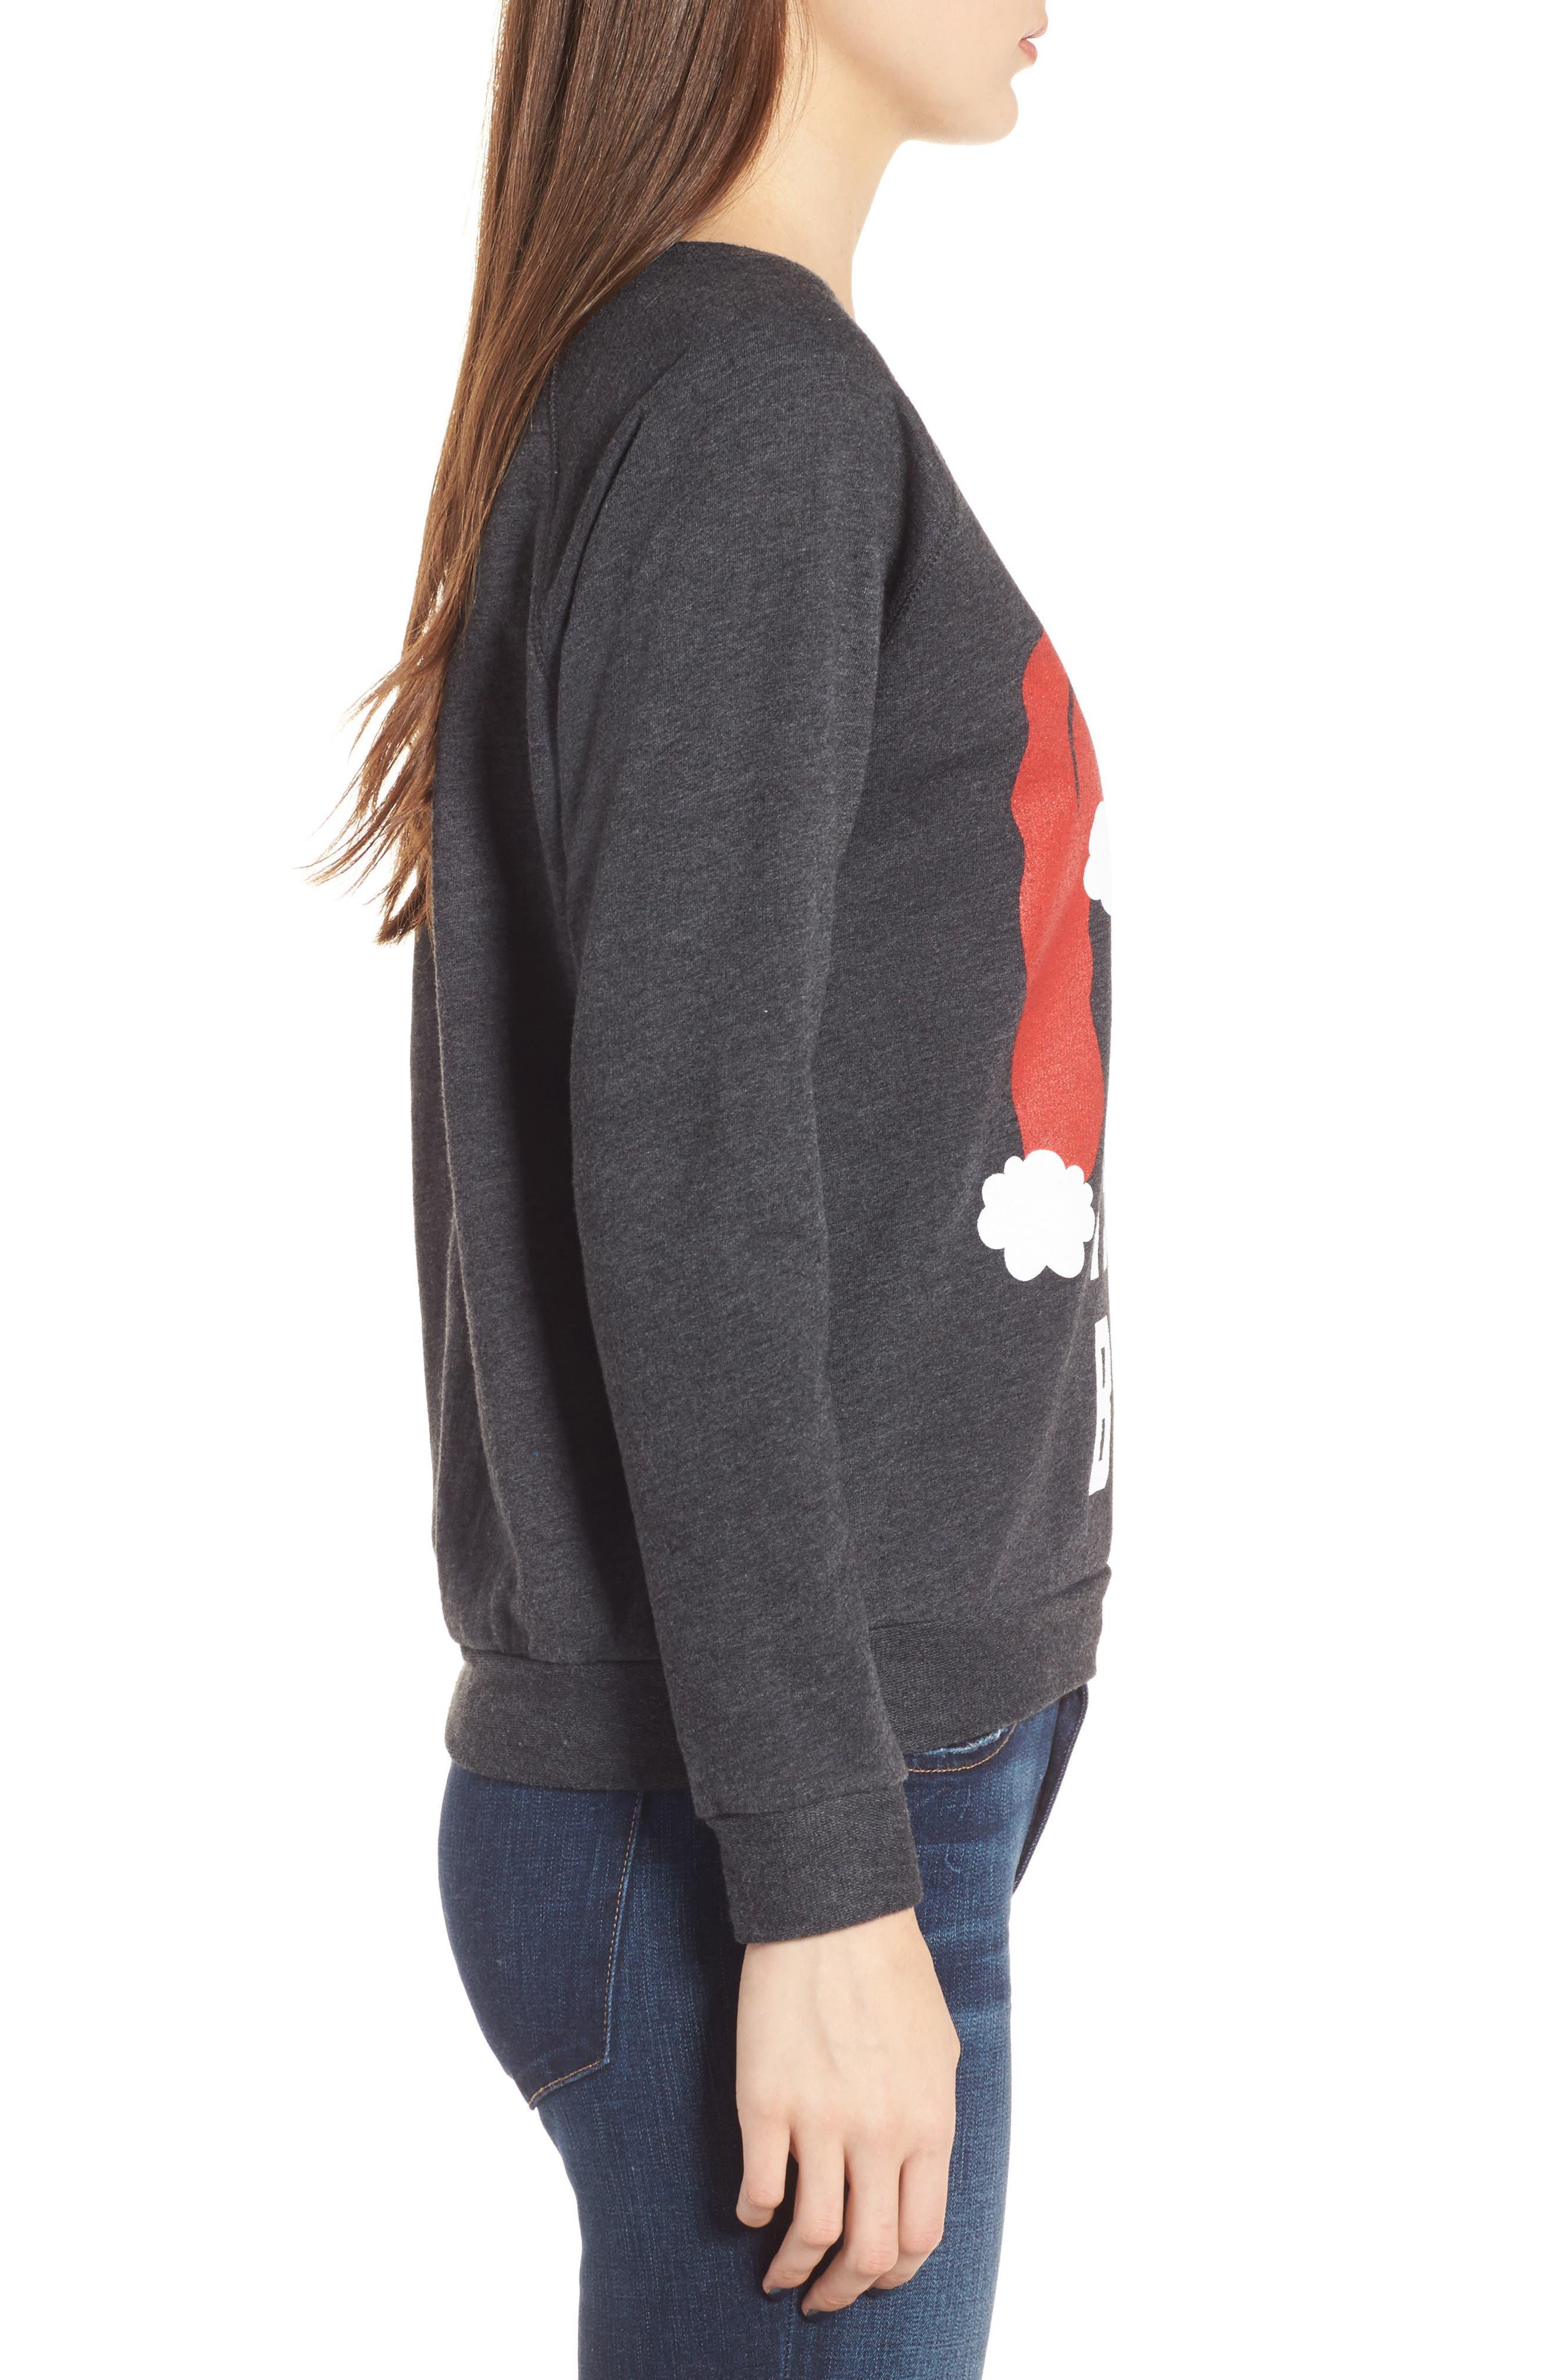 Santa Is My Bae Pullover,                             Alternate thumbnail 3, color,                             020